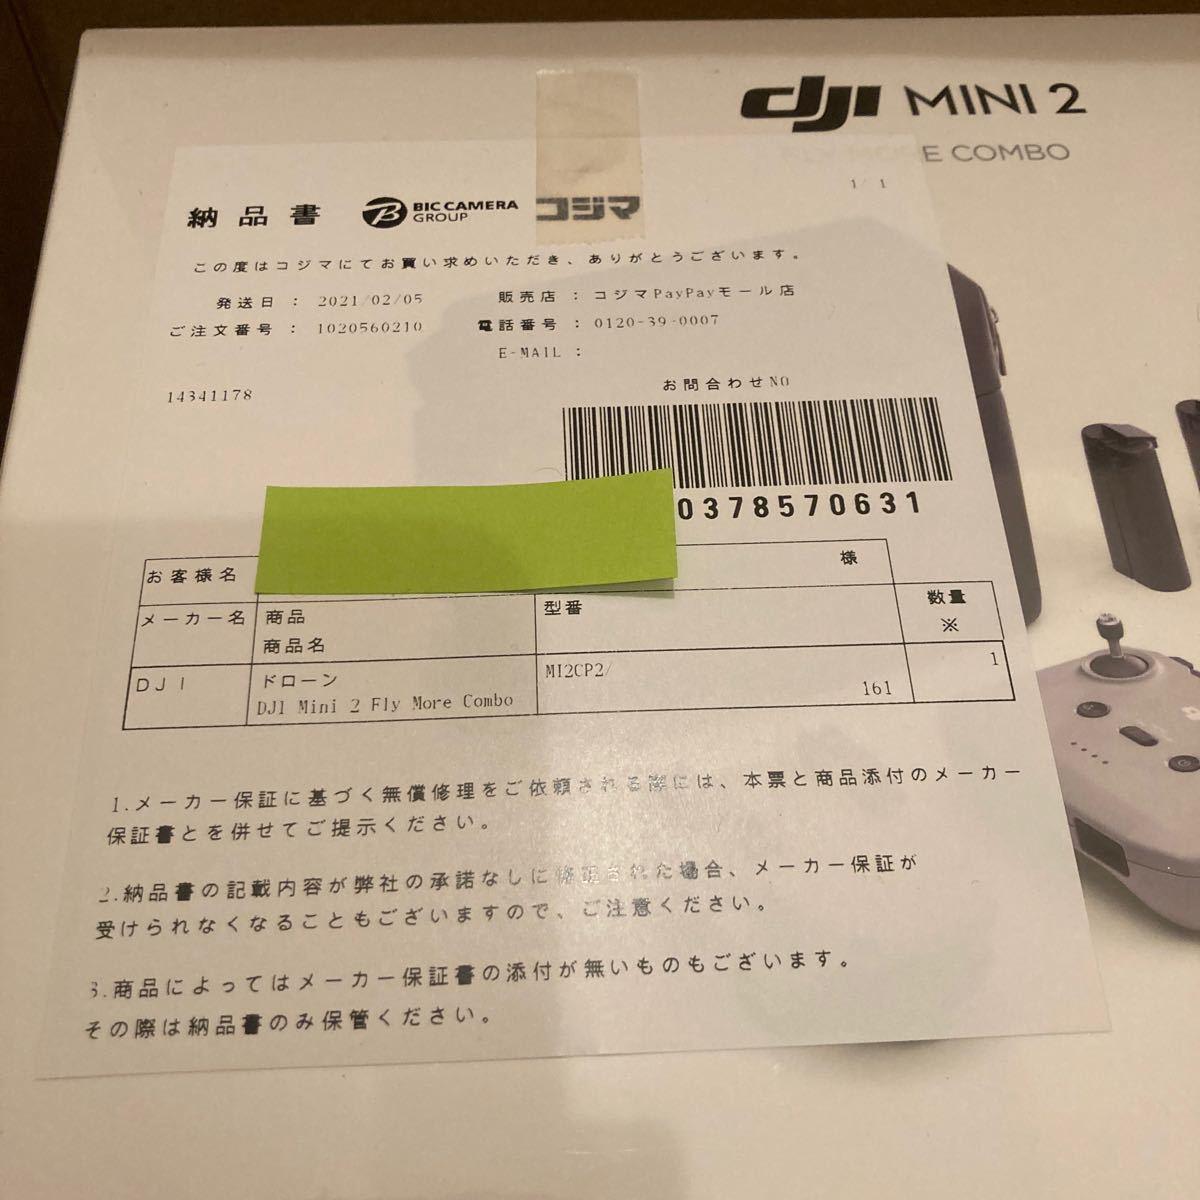 DJI mini2 fly more combo 新品未開封 国内正規品